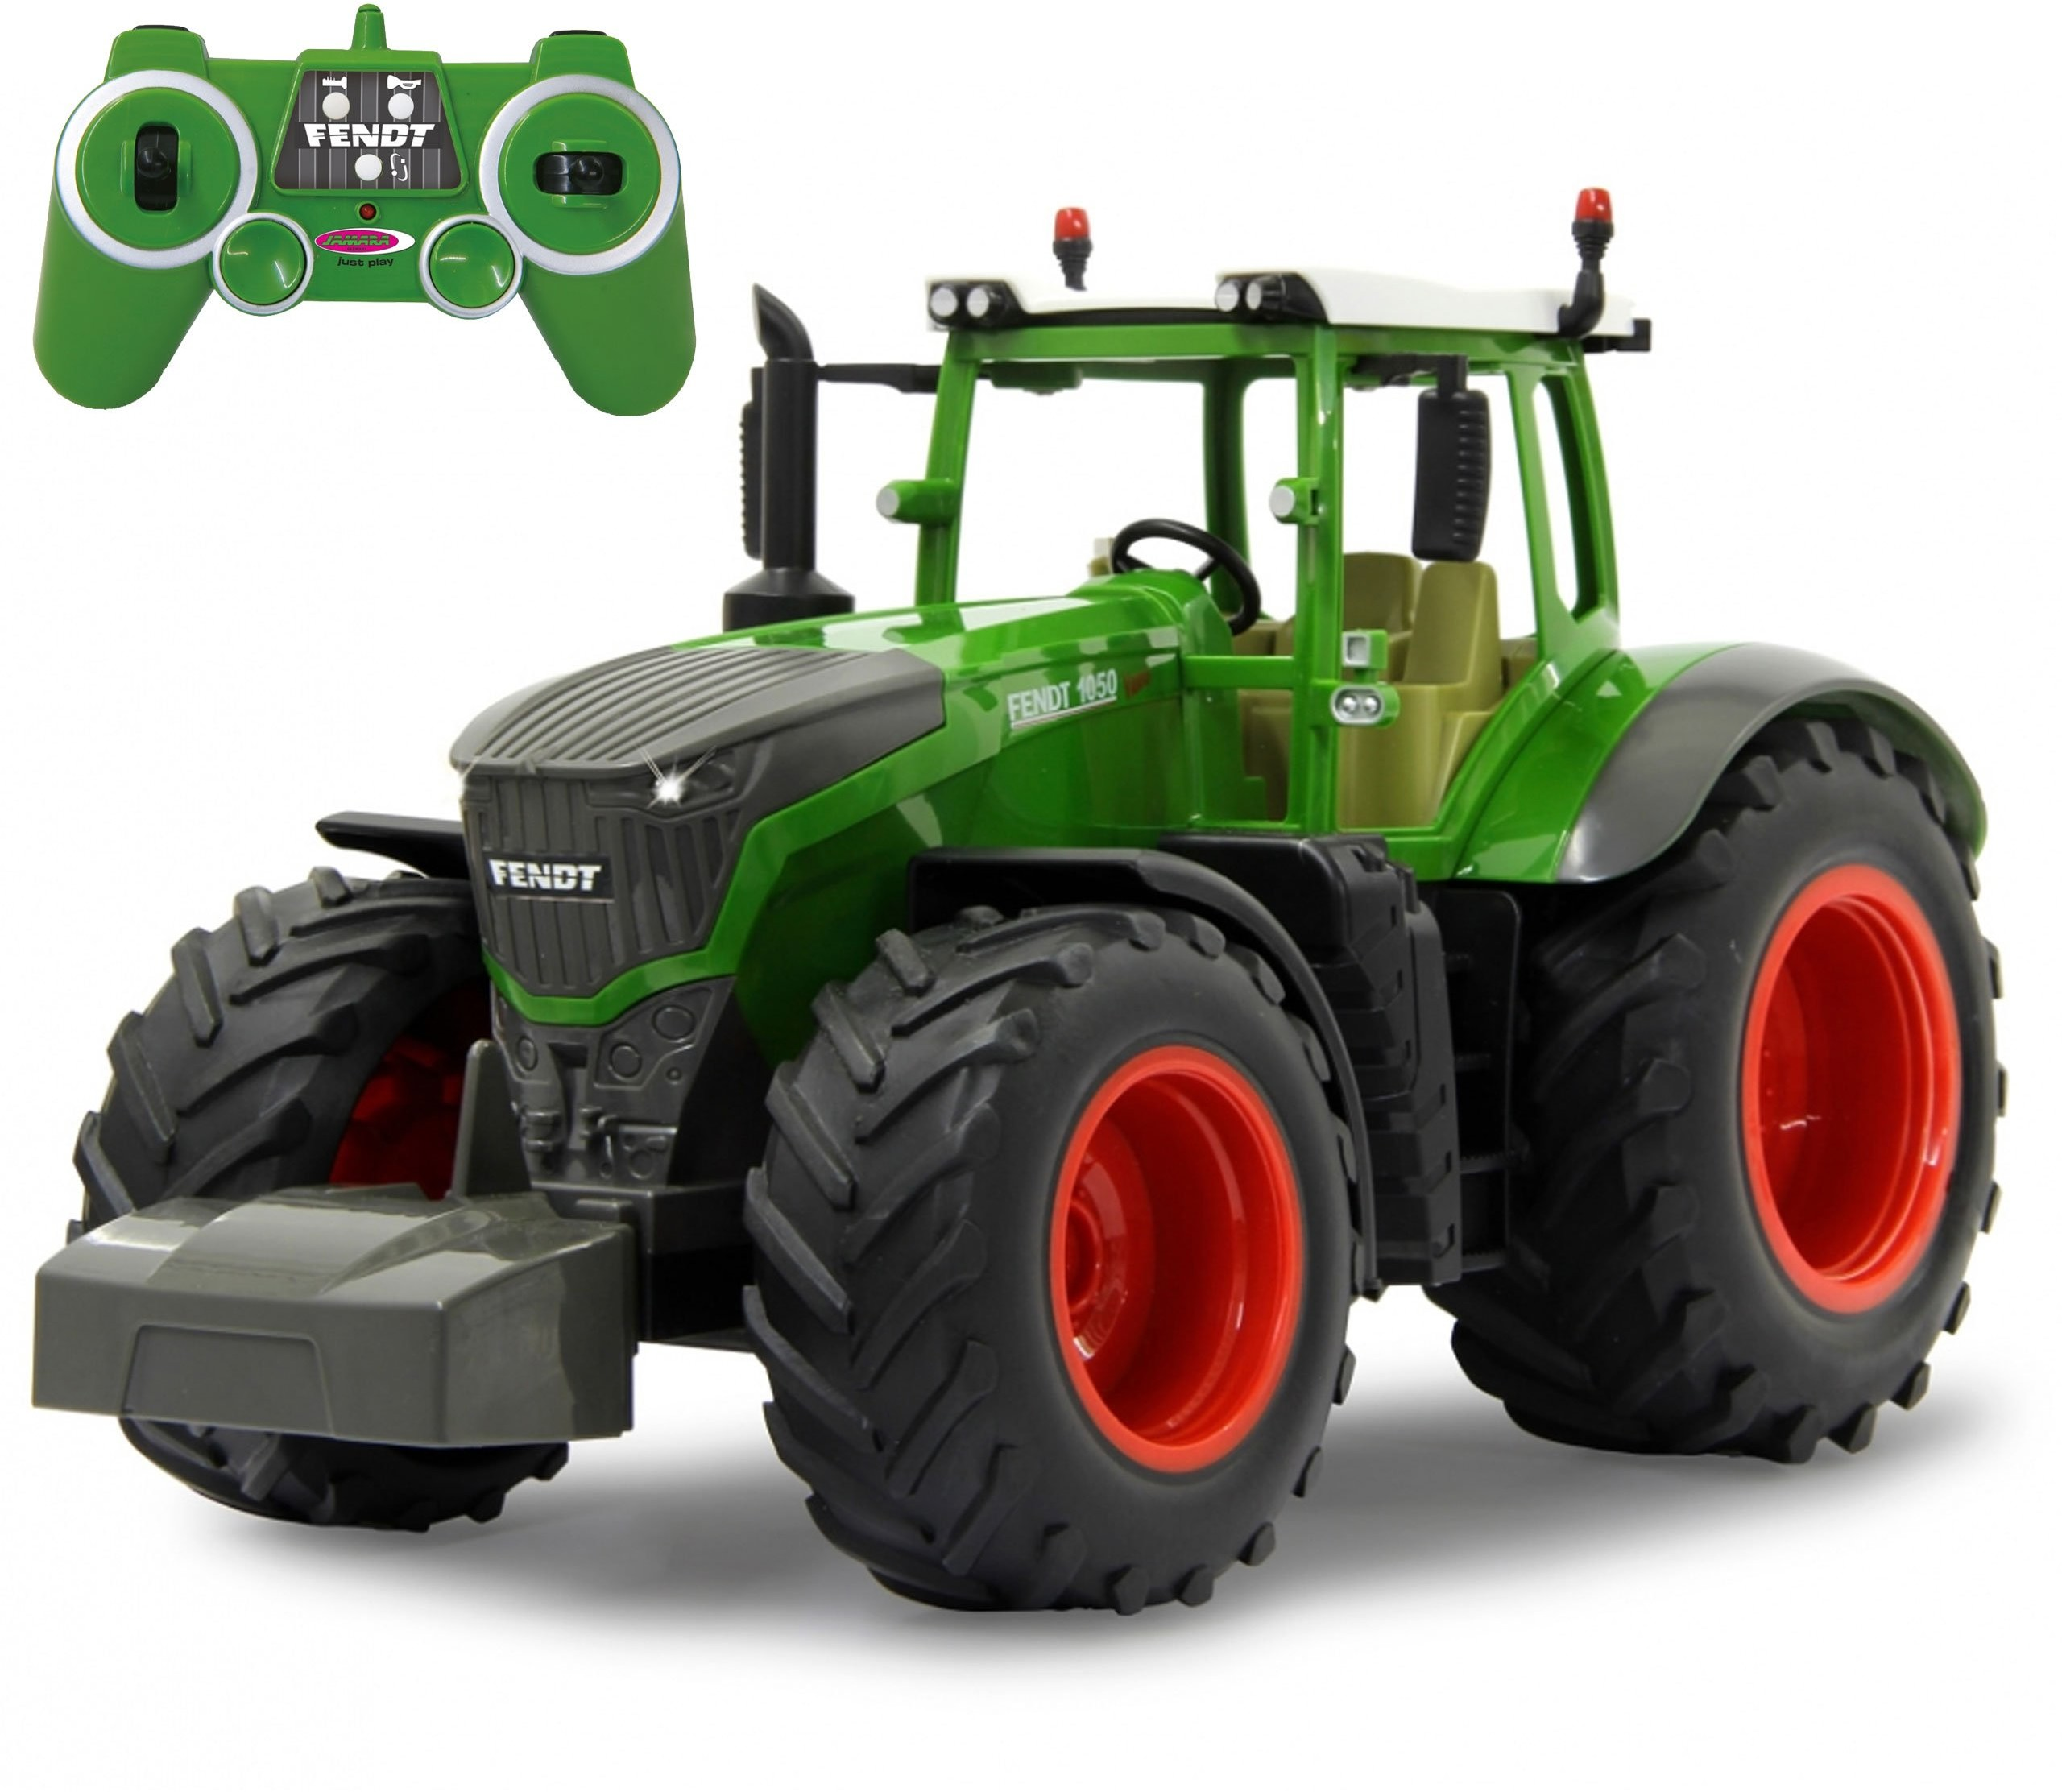 Jamara Traktor Fendt 1050 Vario Zdalnie sterowany RC 1:16 2375